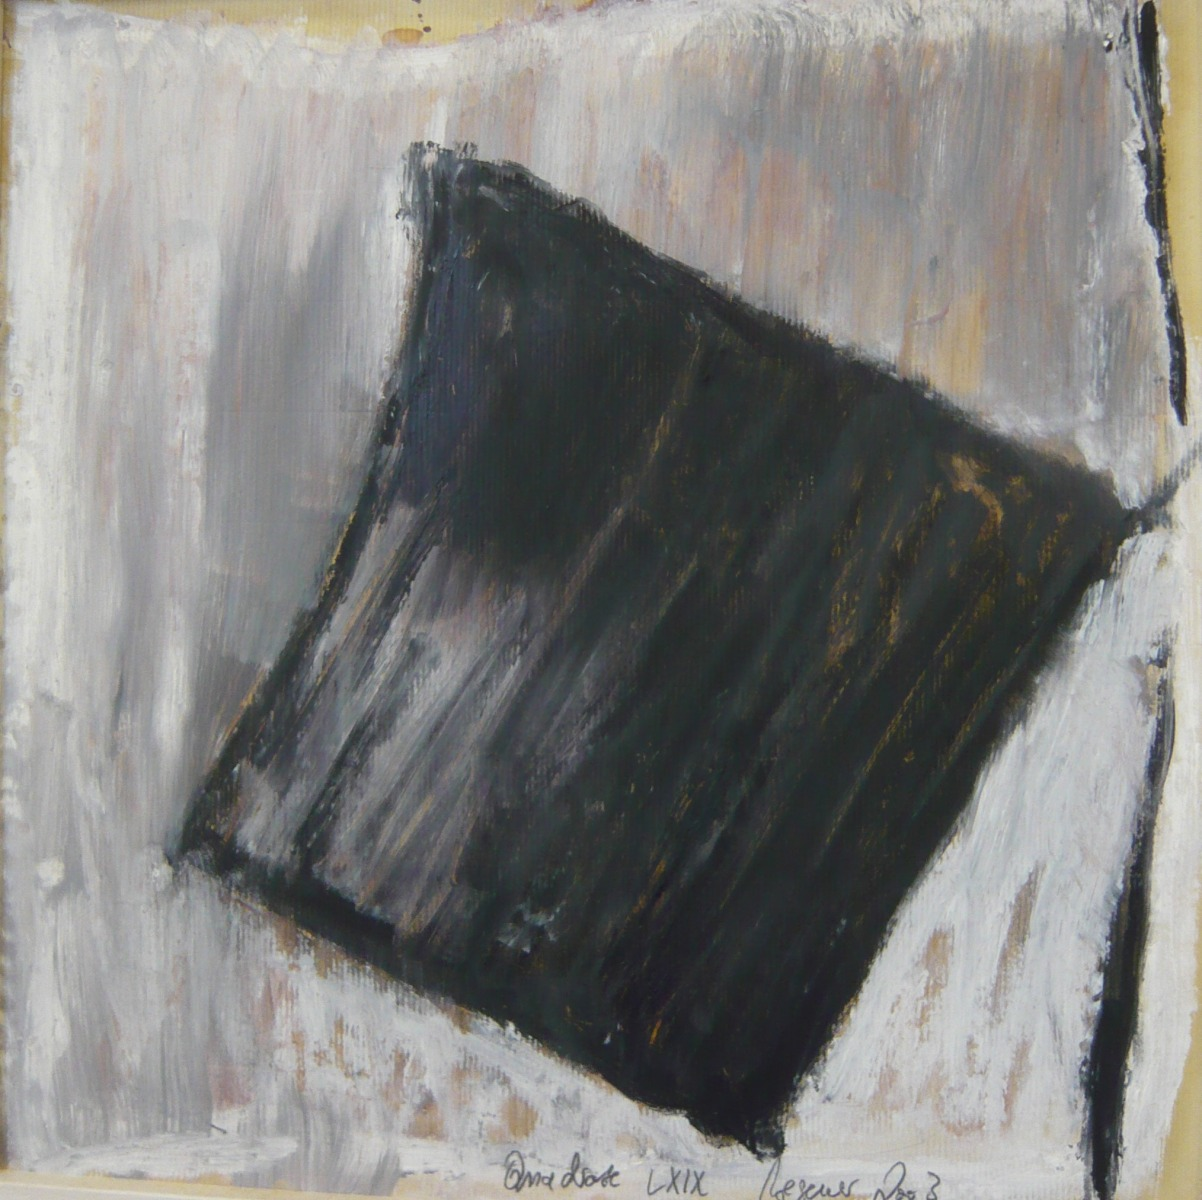 Quadrat LXIX